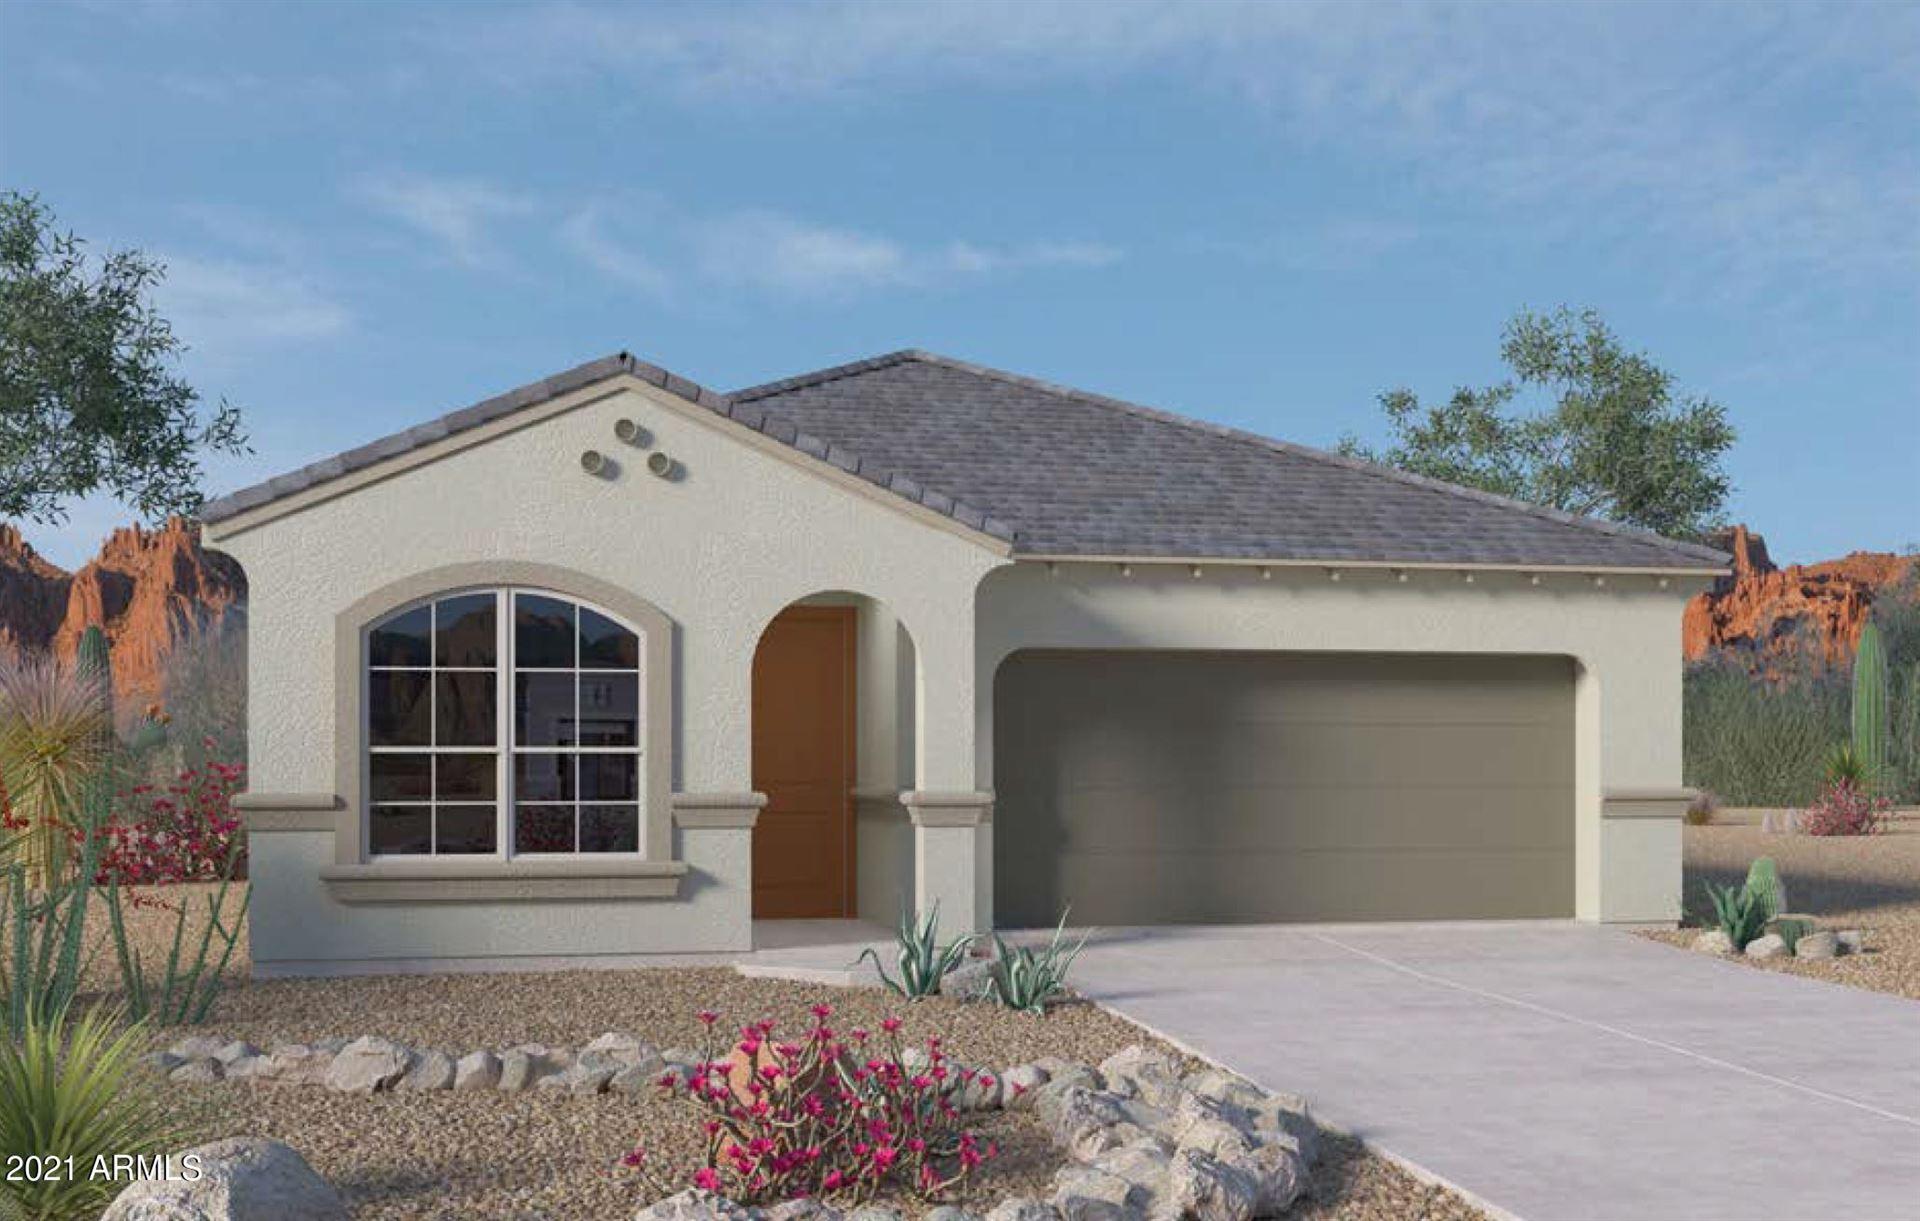 Photo of 38090 W SAN ALVAREZ Avenue, Maricopa, AZ 85138 (MLS # 6202308)